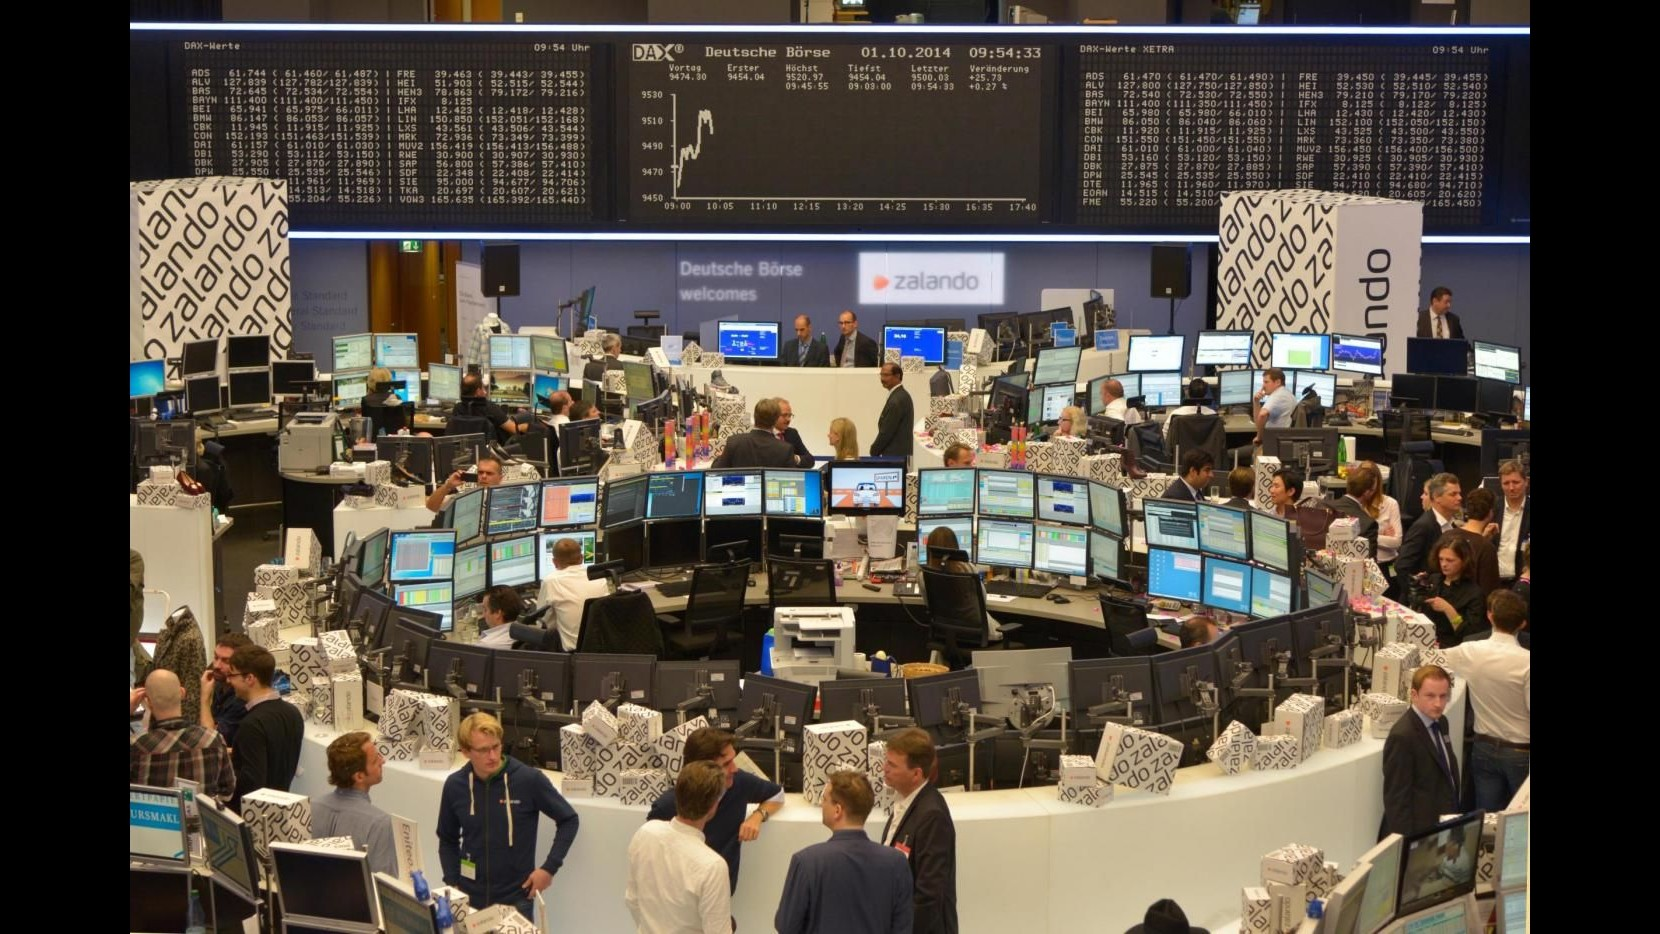 Borsa, andamento positivo per i futures lisitini europei: Londra +0.3%